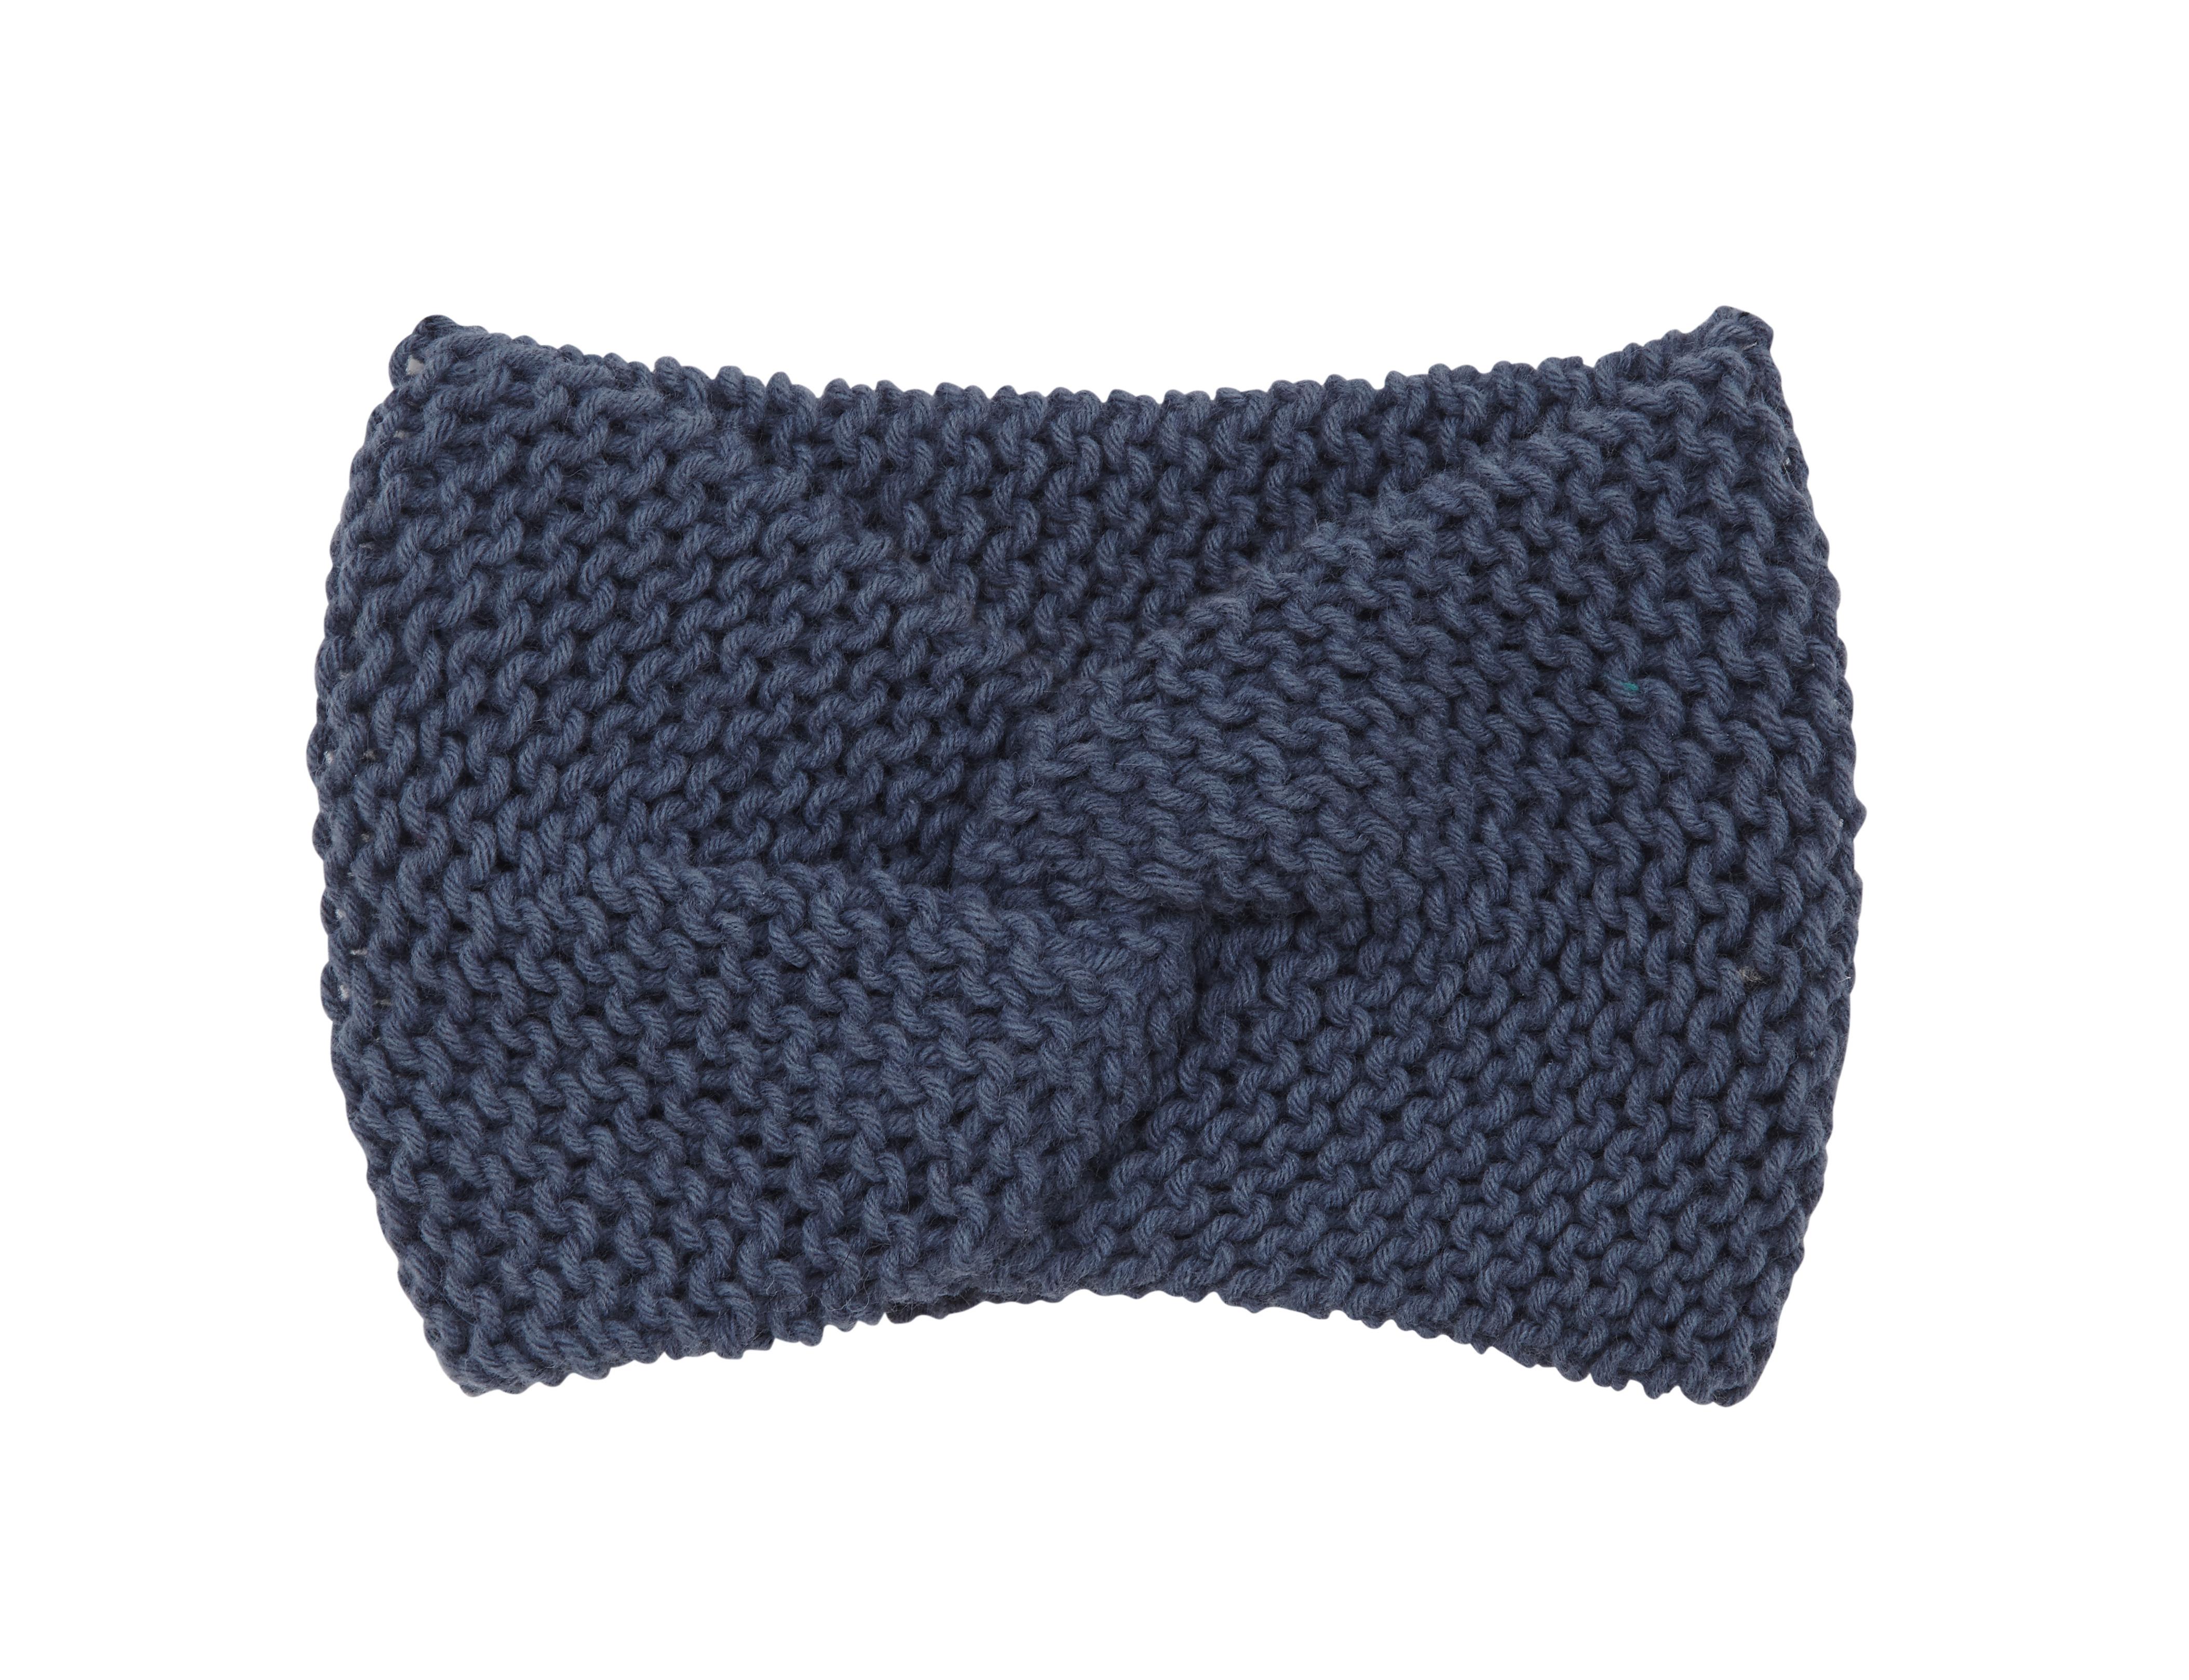 Wool head band, £6.99, TK maxx